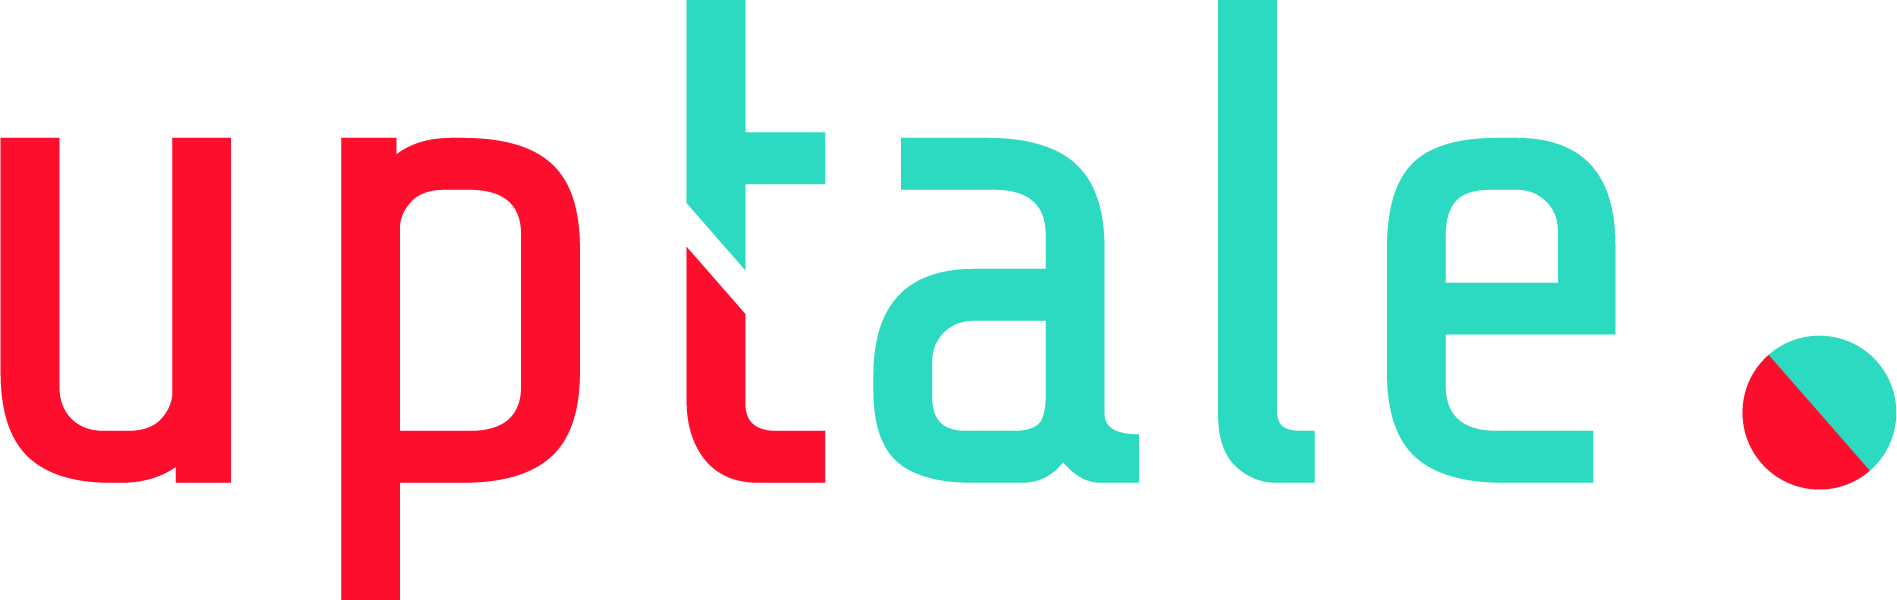 Uptale-web-logo